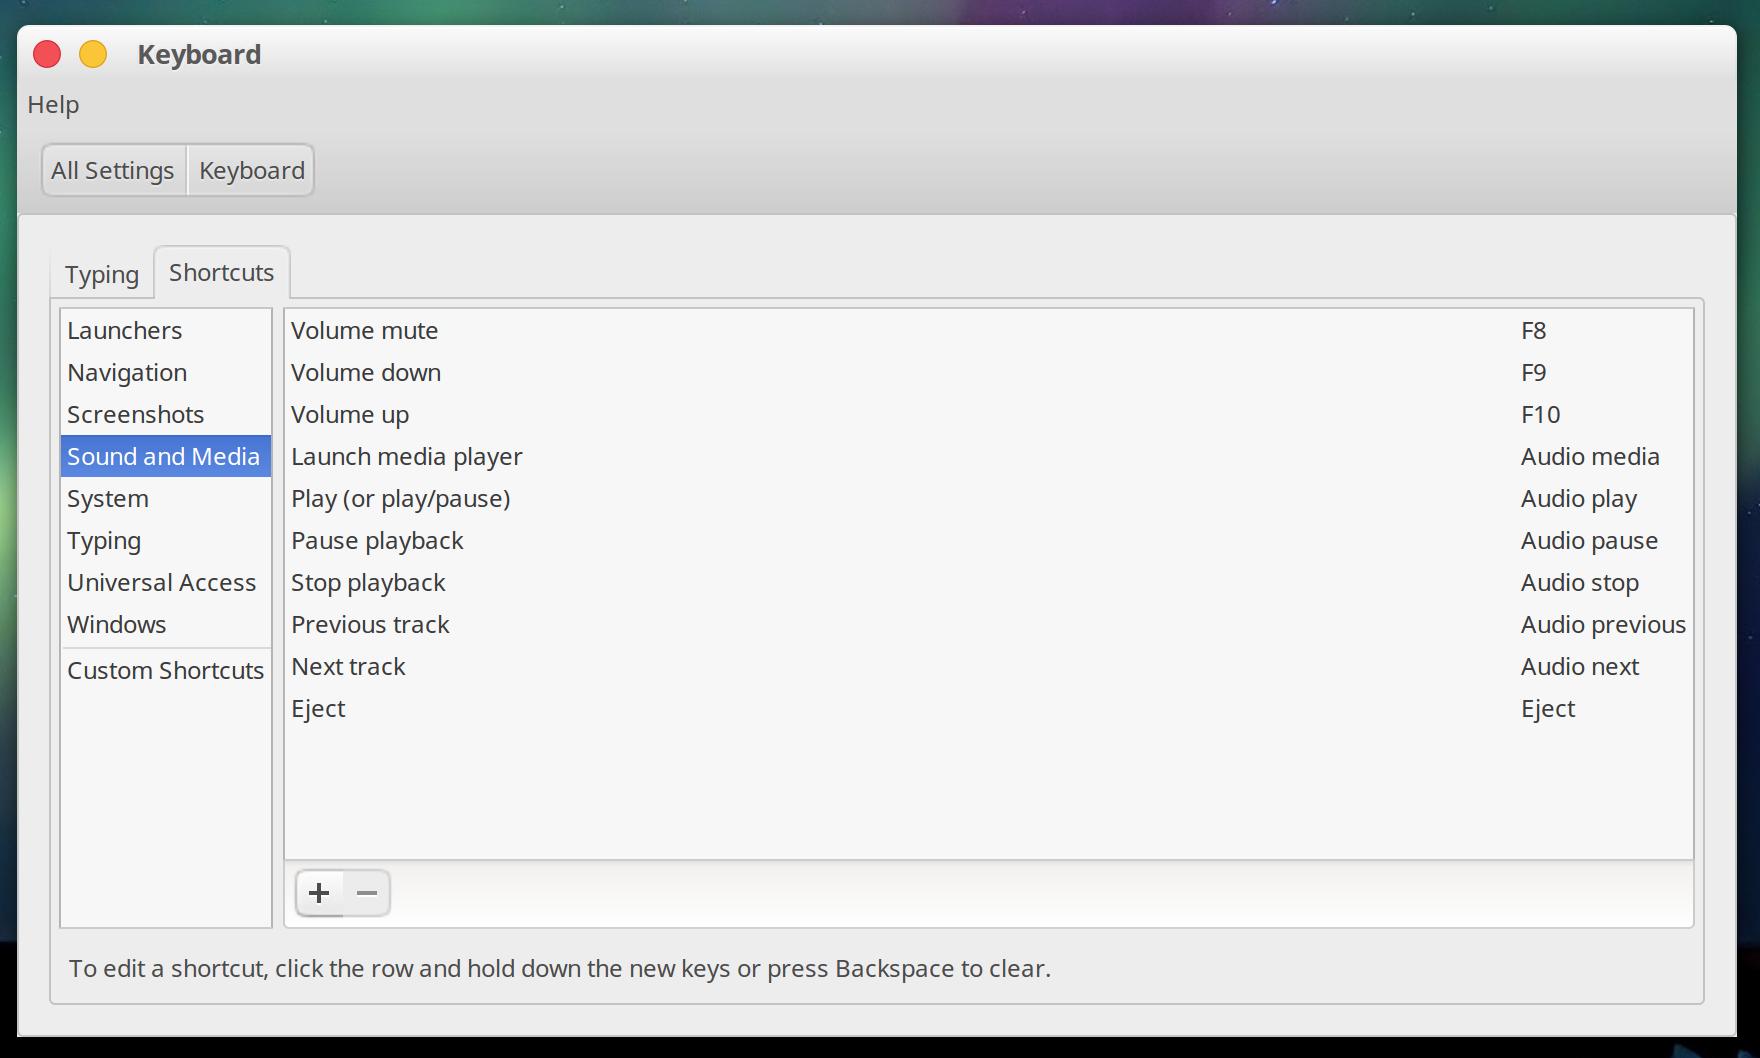 Ubuntu Keyboard settings dialog showing volume shortcuts